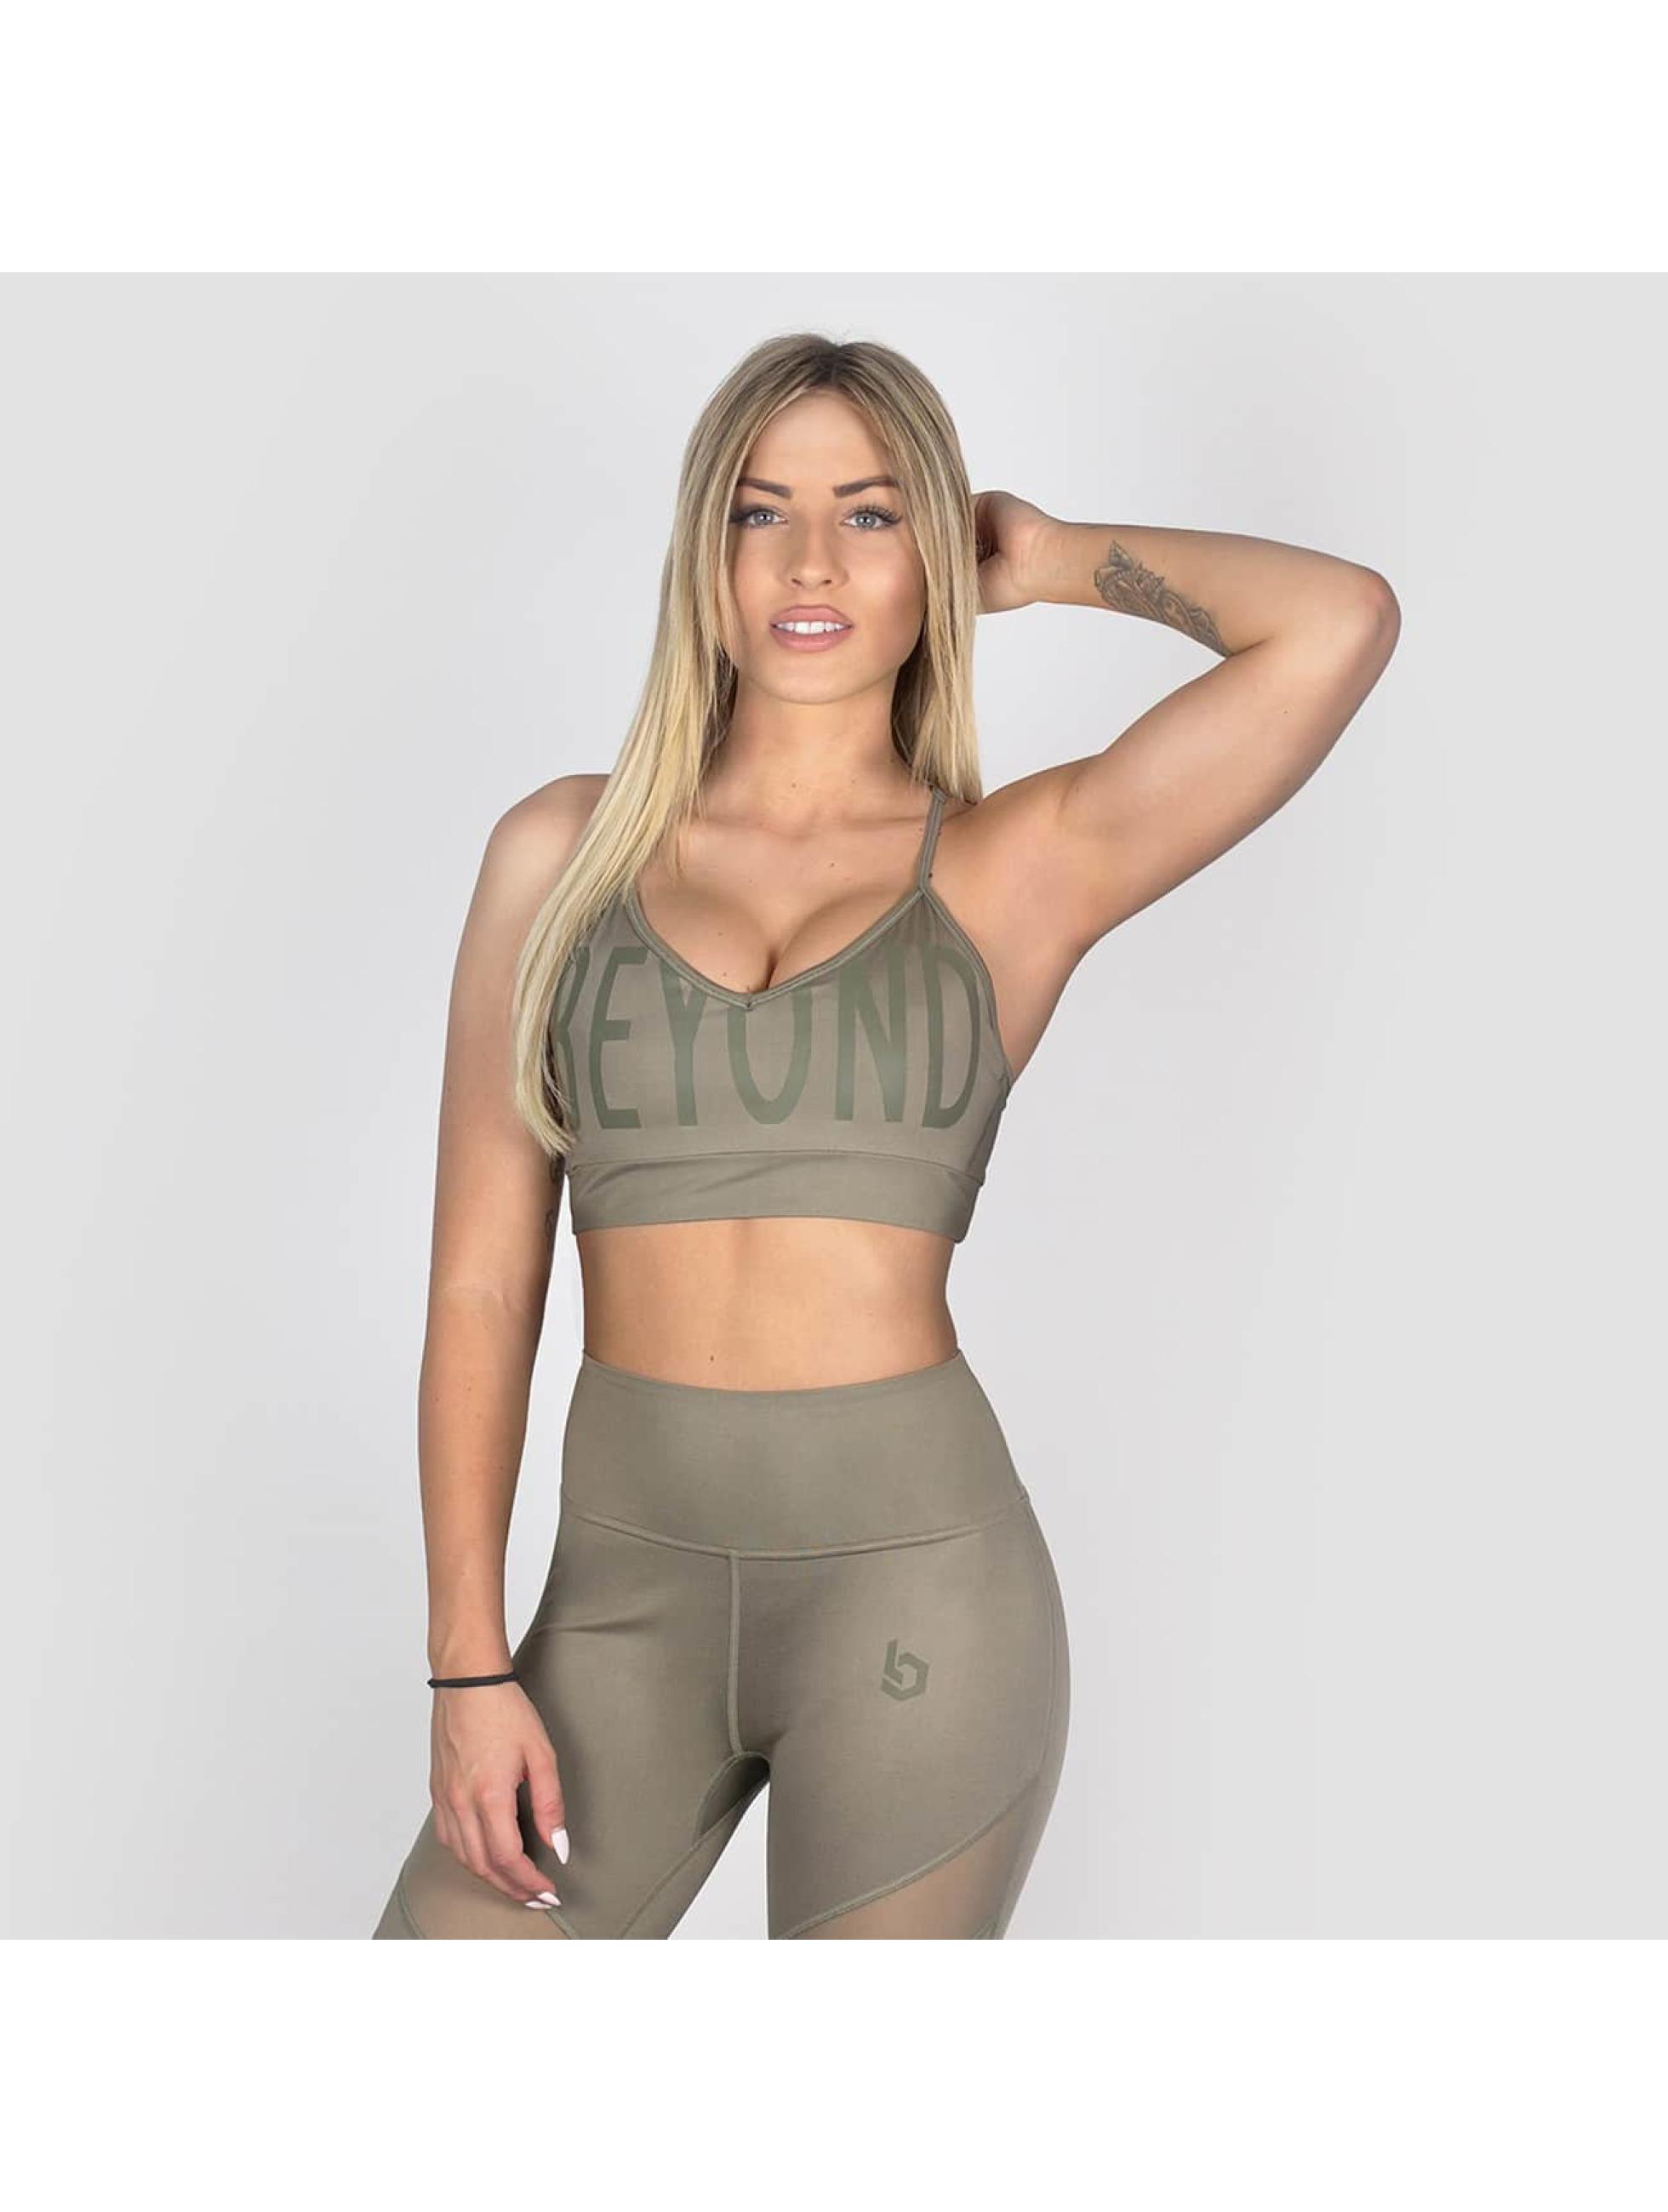 Beyond Limits Underwear Triangle khaki